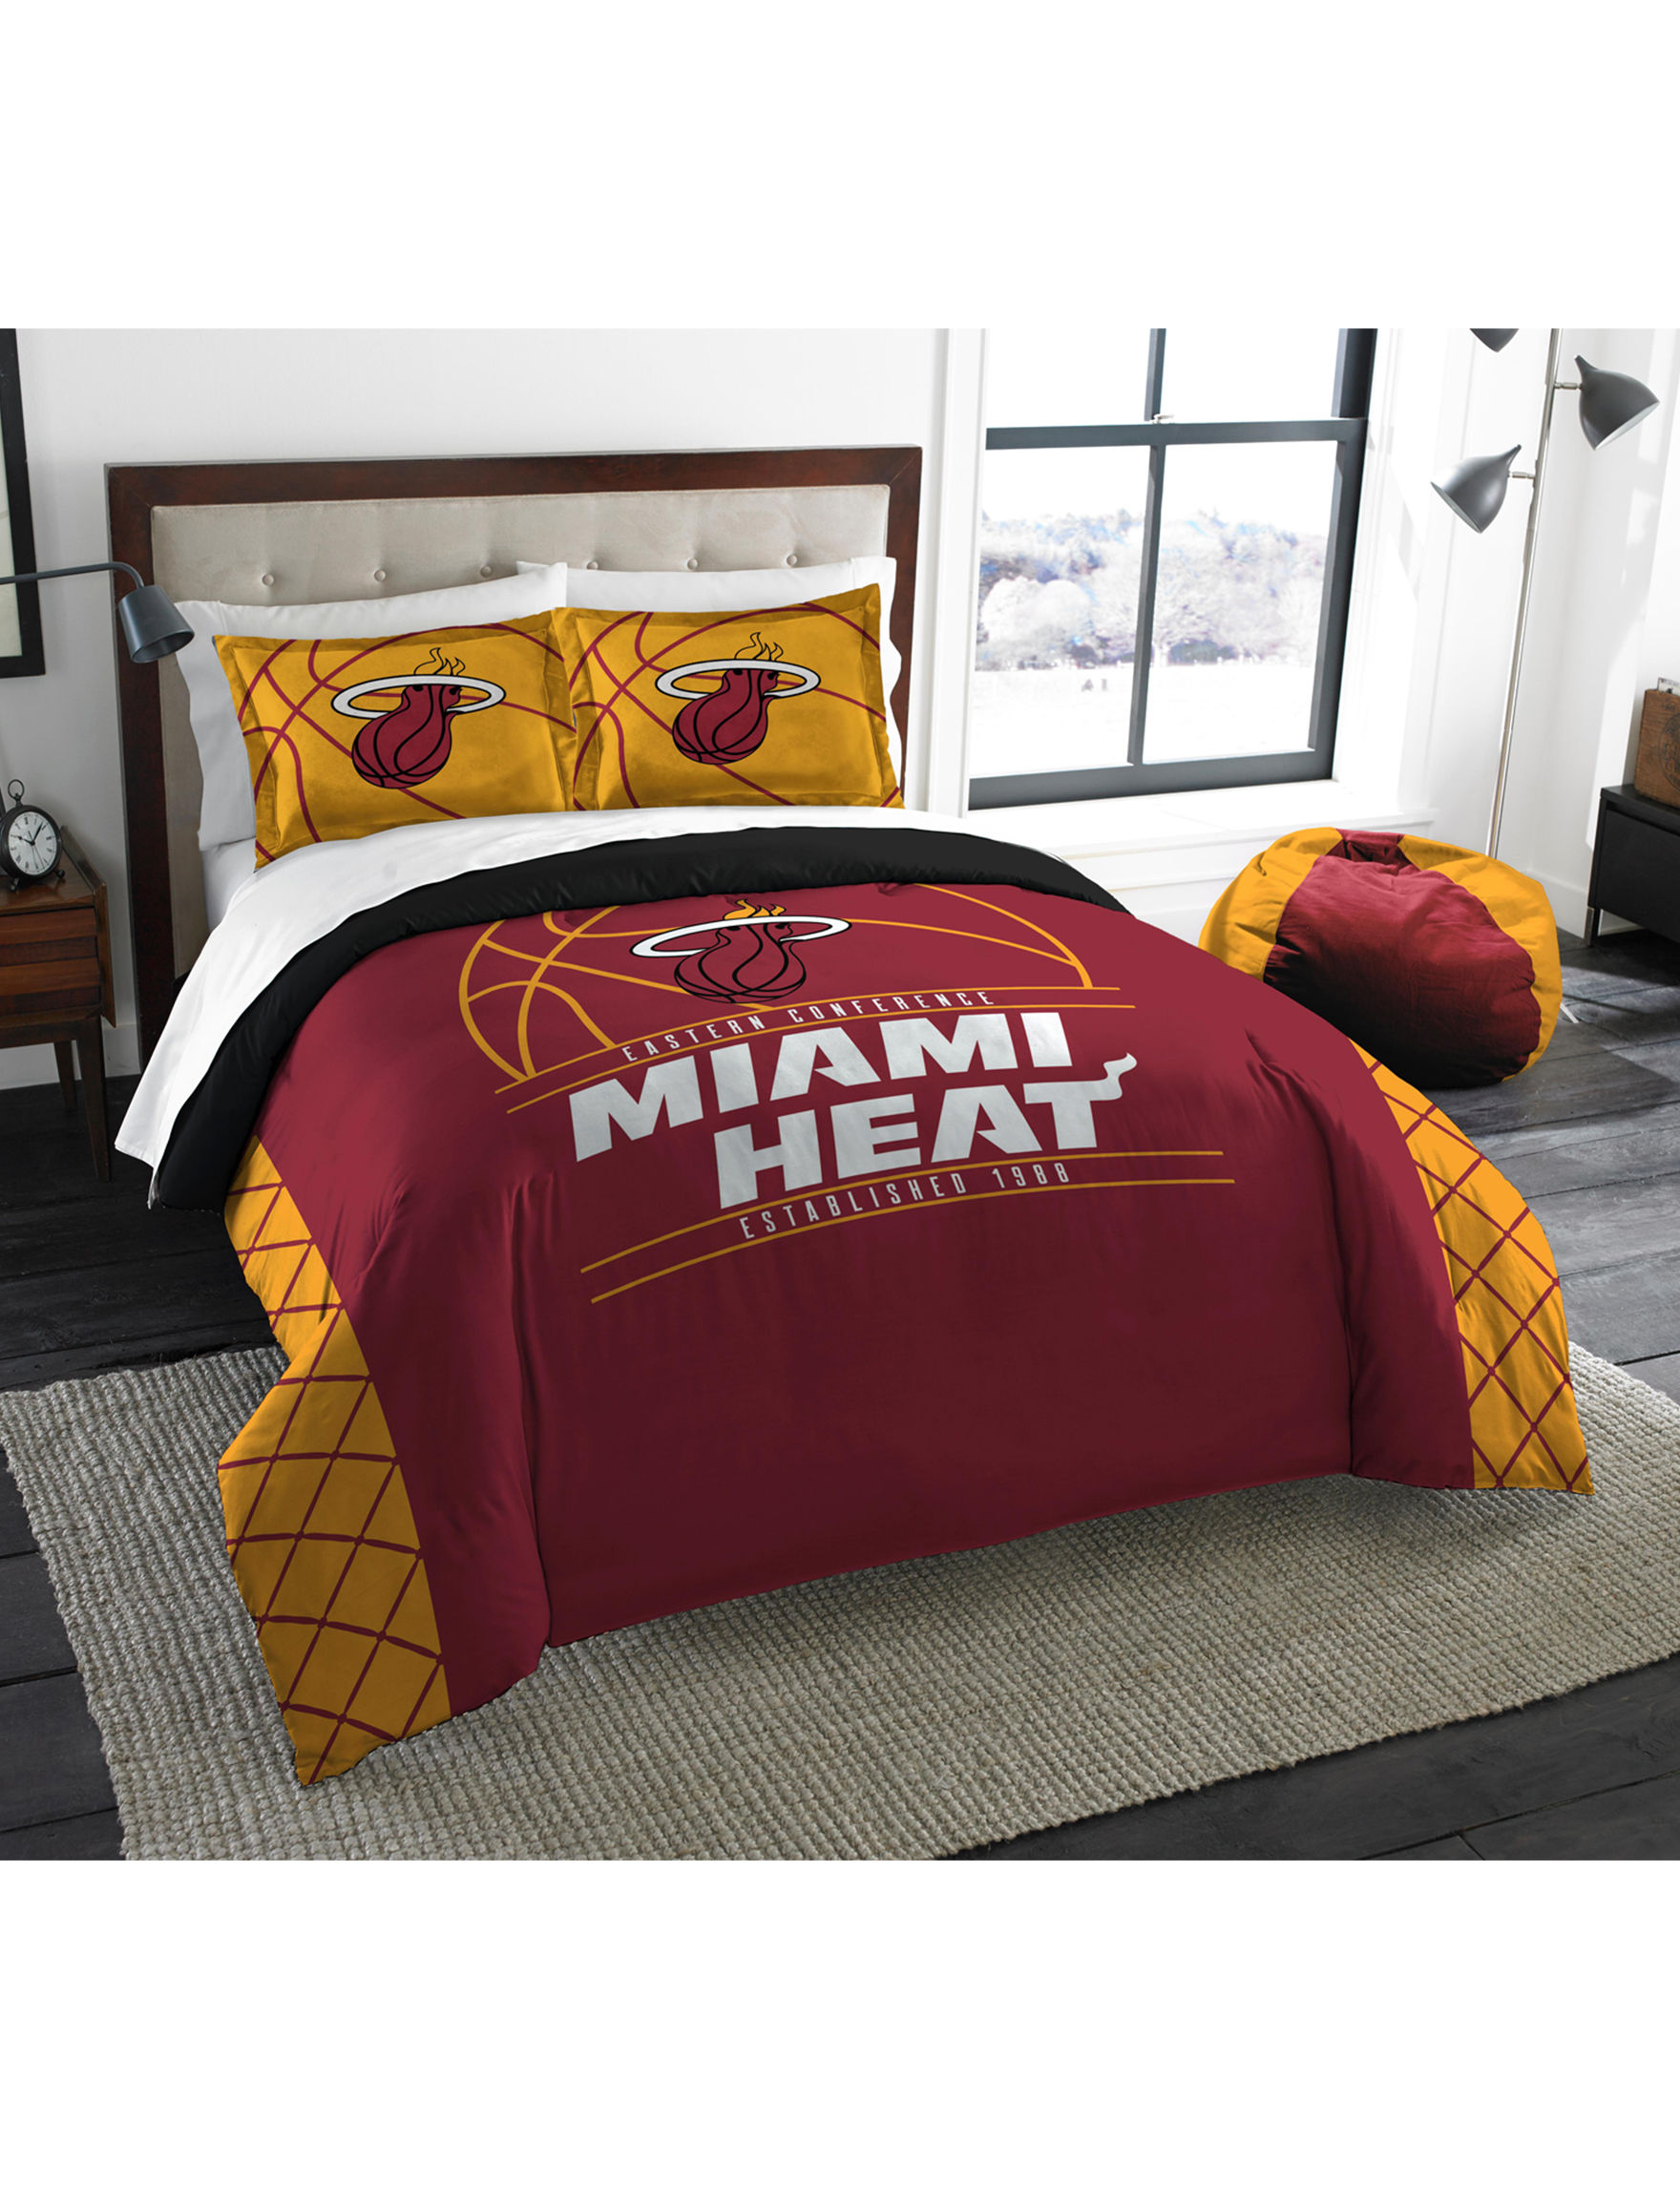 The Northwest Company Red / Yellow Comforters & Comforter Sets NBA